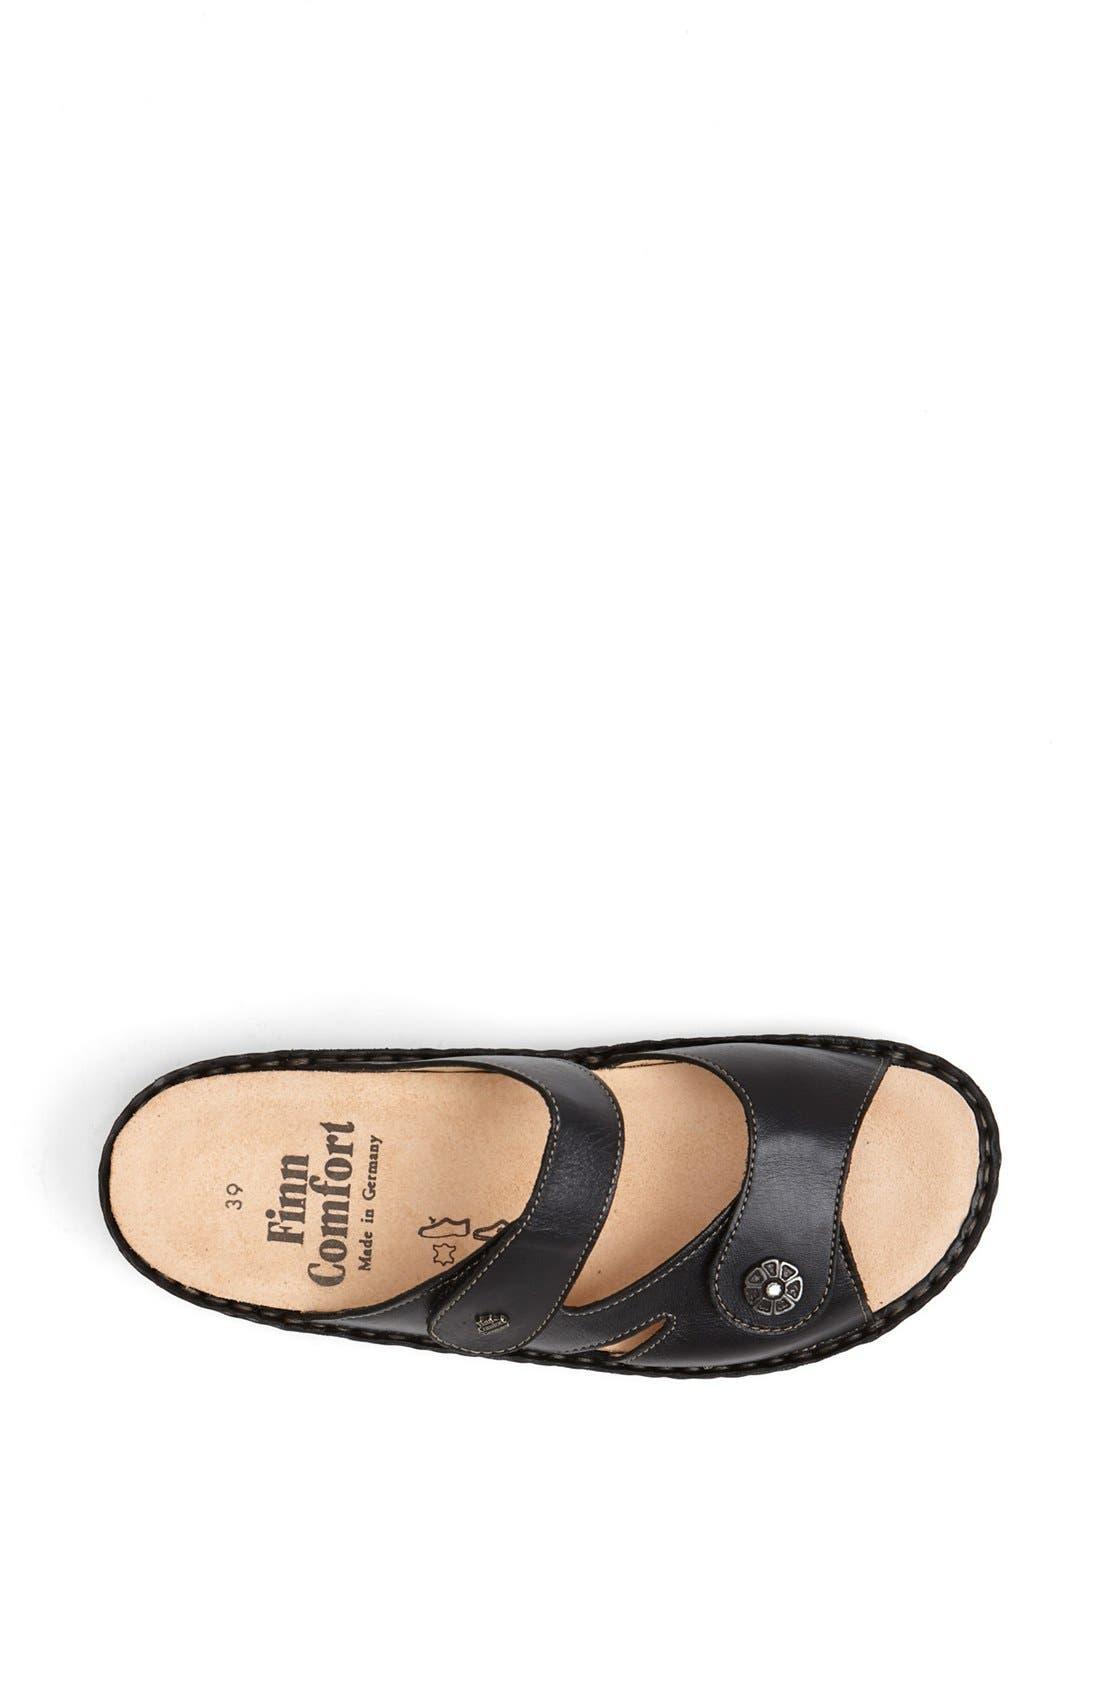 FINNAMIC by Finn Comfort 'Sanaa' Walking Sandal,                             Alternate thumbnail 3, color,                             Black